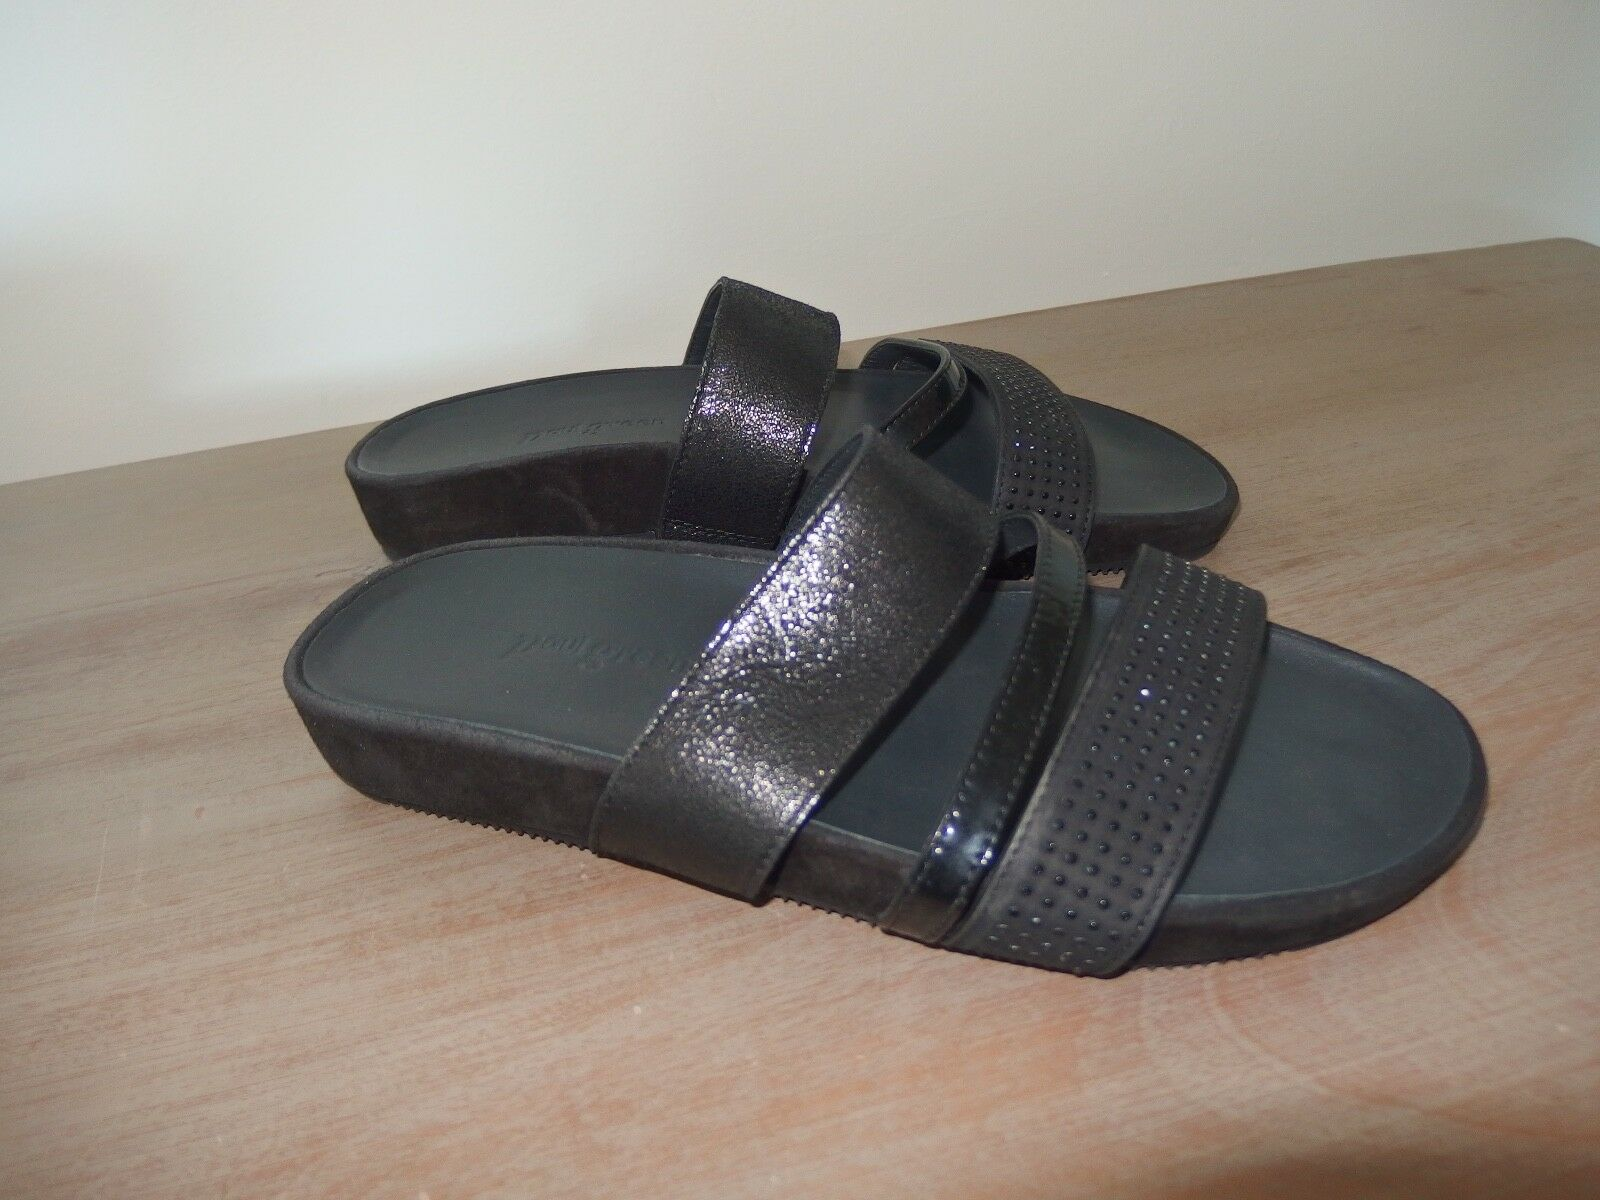 Paul Green Damen Pantolette Sandalee schwarz Echtleder Gr. 38 neuwertig